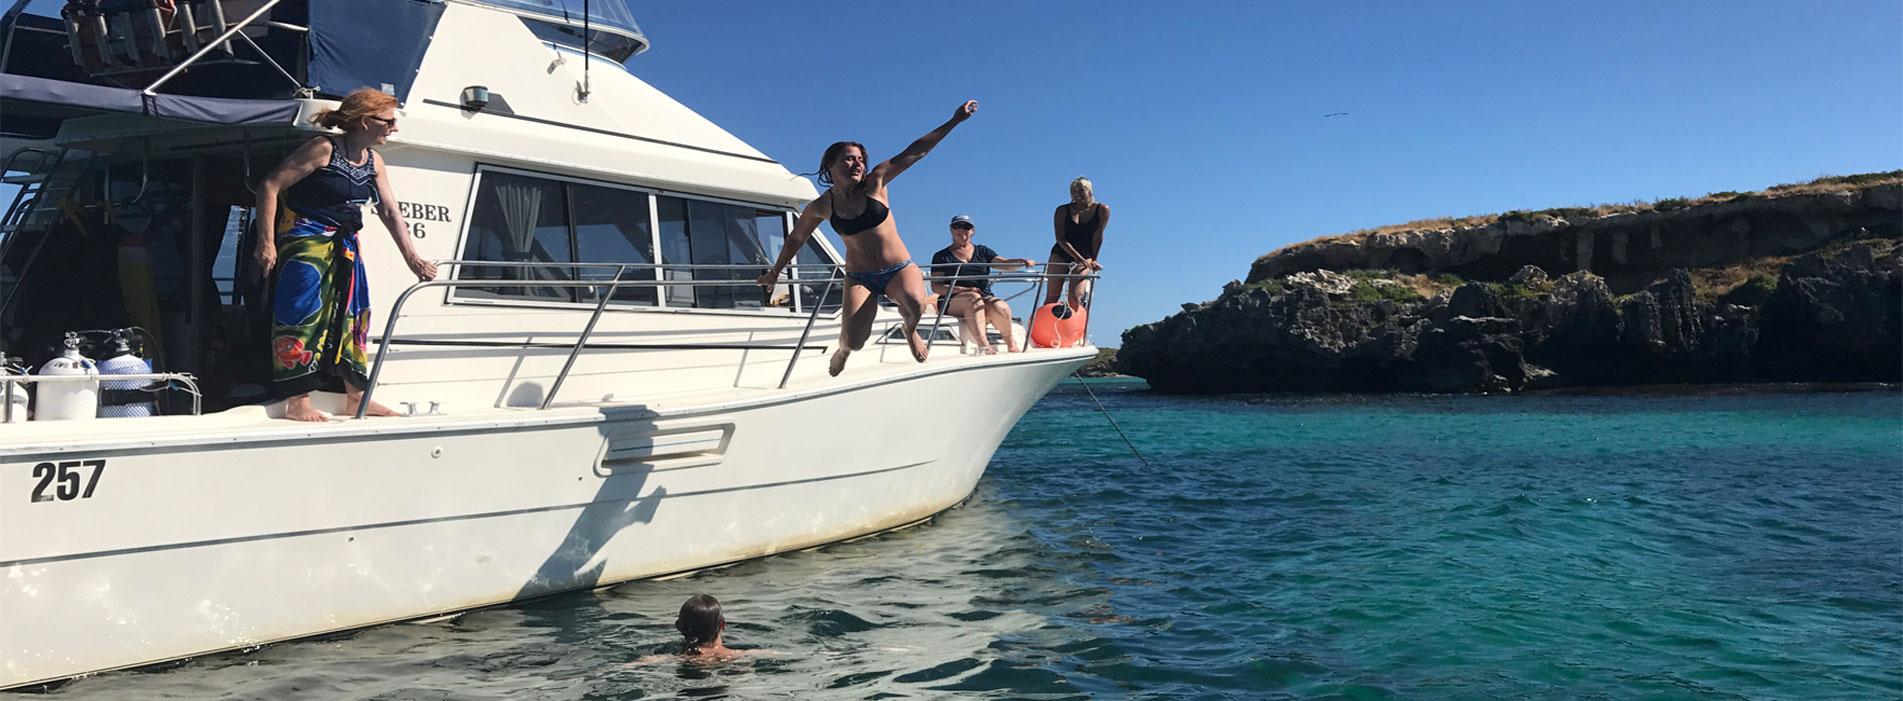 MOONSHINE-II-boat-charter-carnac-island-jump-in-water